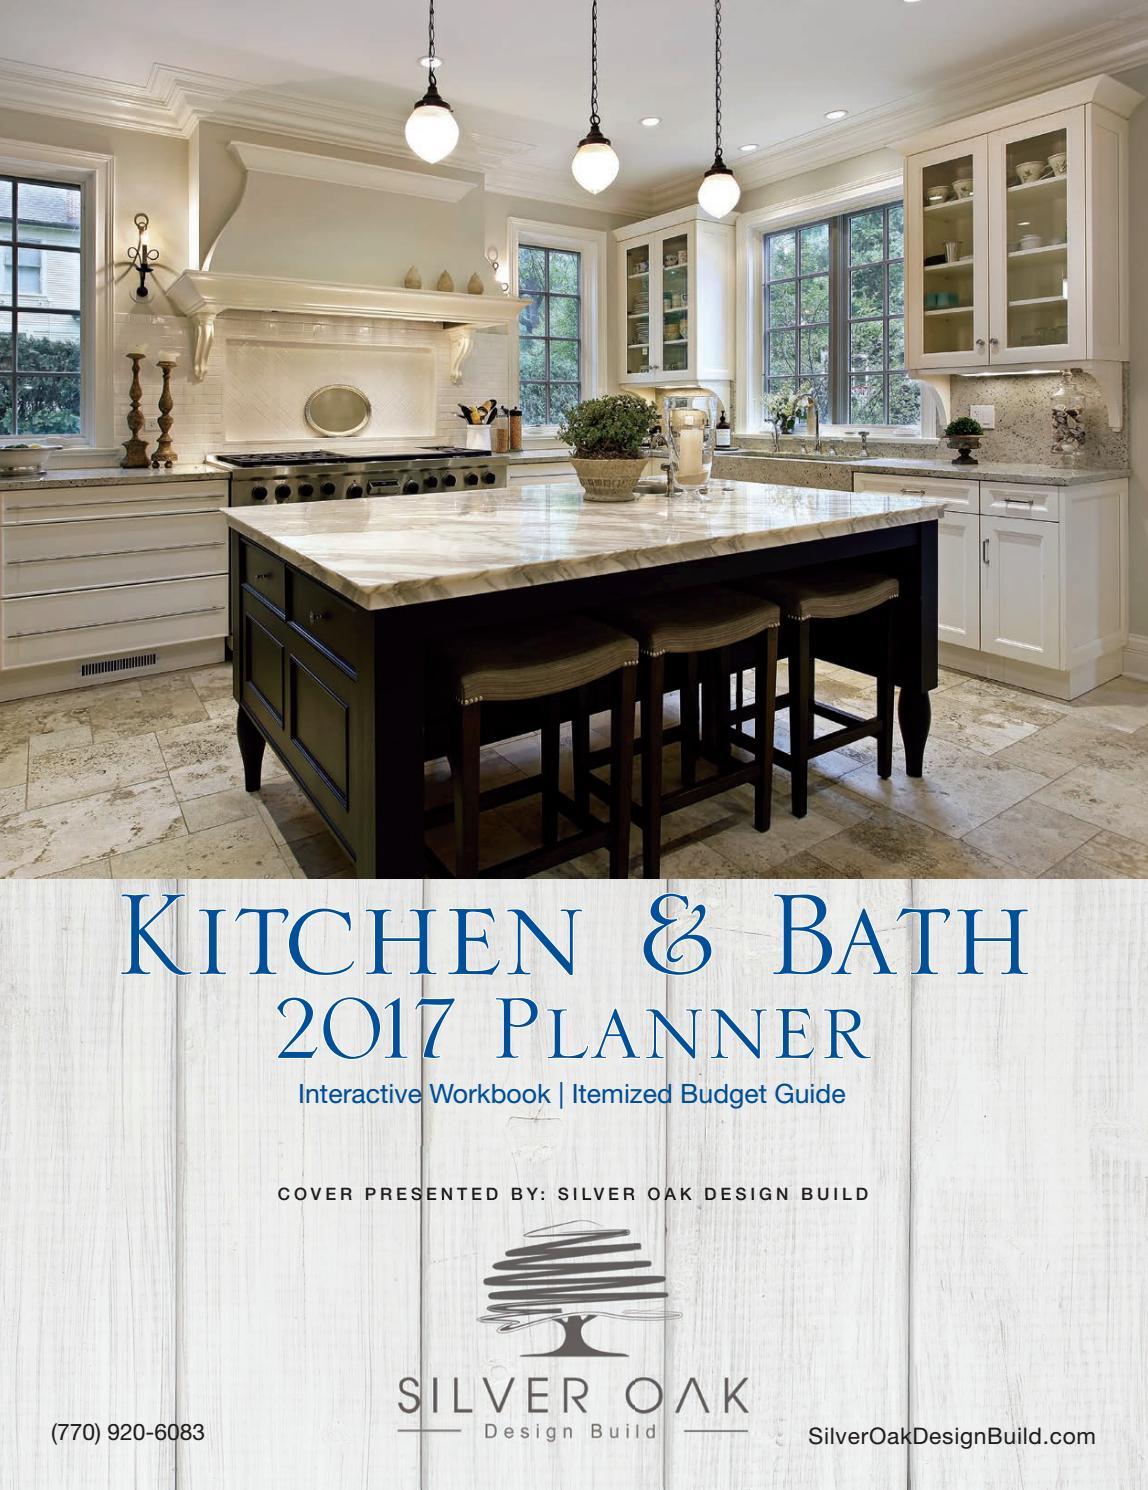 Kitchen And Bath Magazine my home improvement magazine - issuu